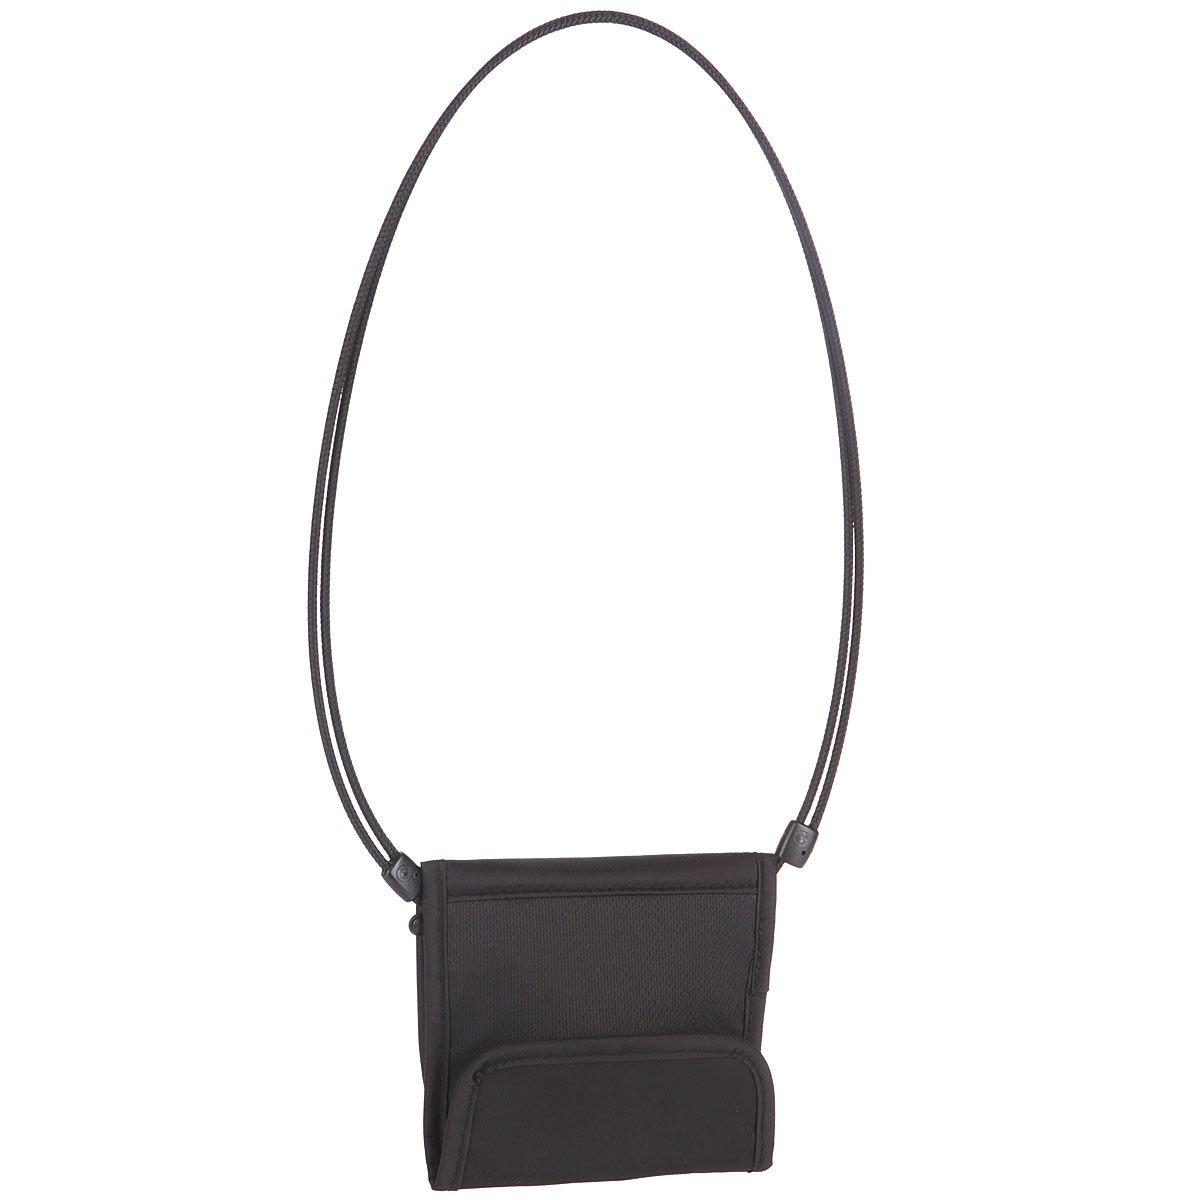 сумка pacsafe на пояс coversafe 100 : Pacsafe coversafe black